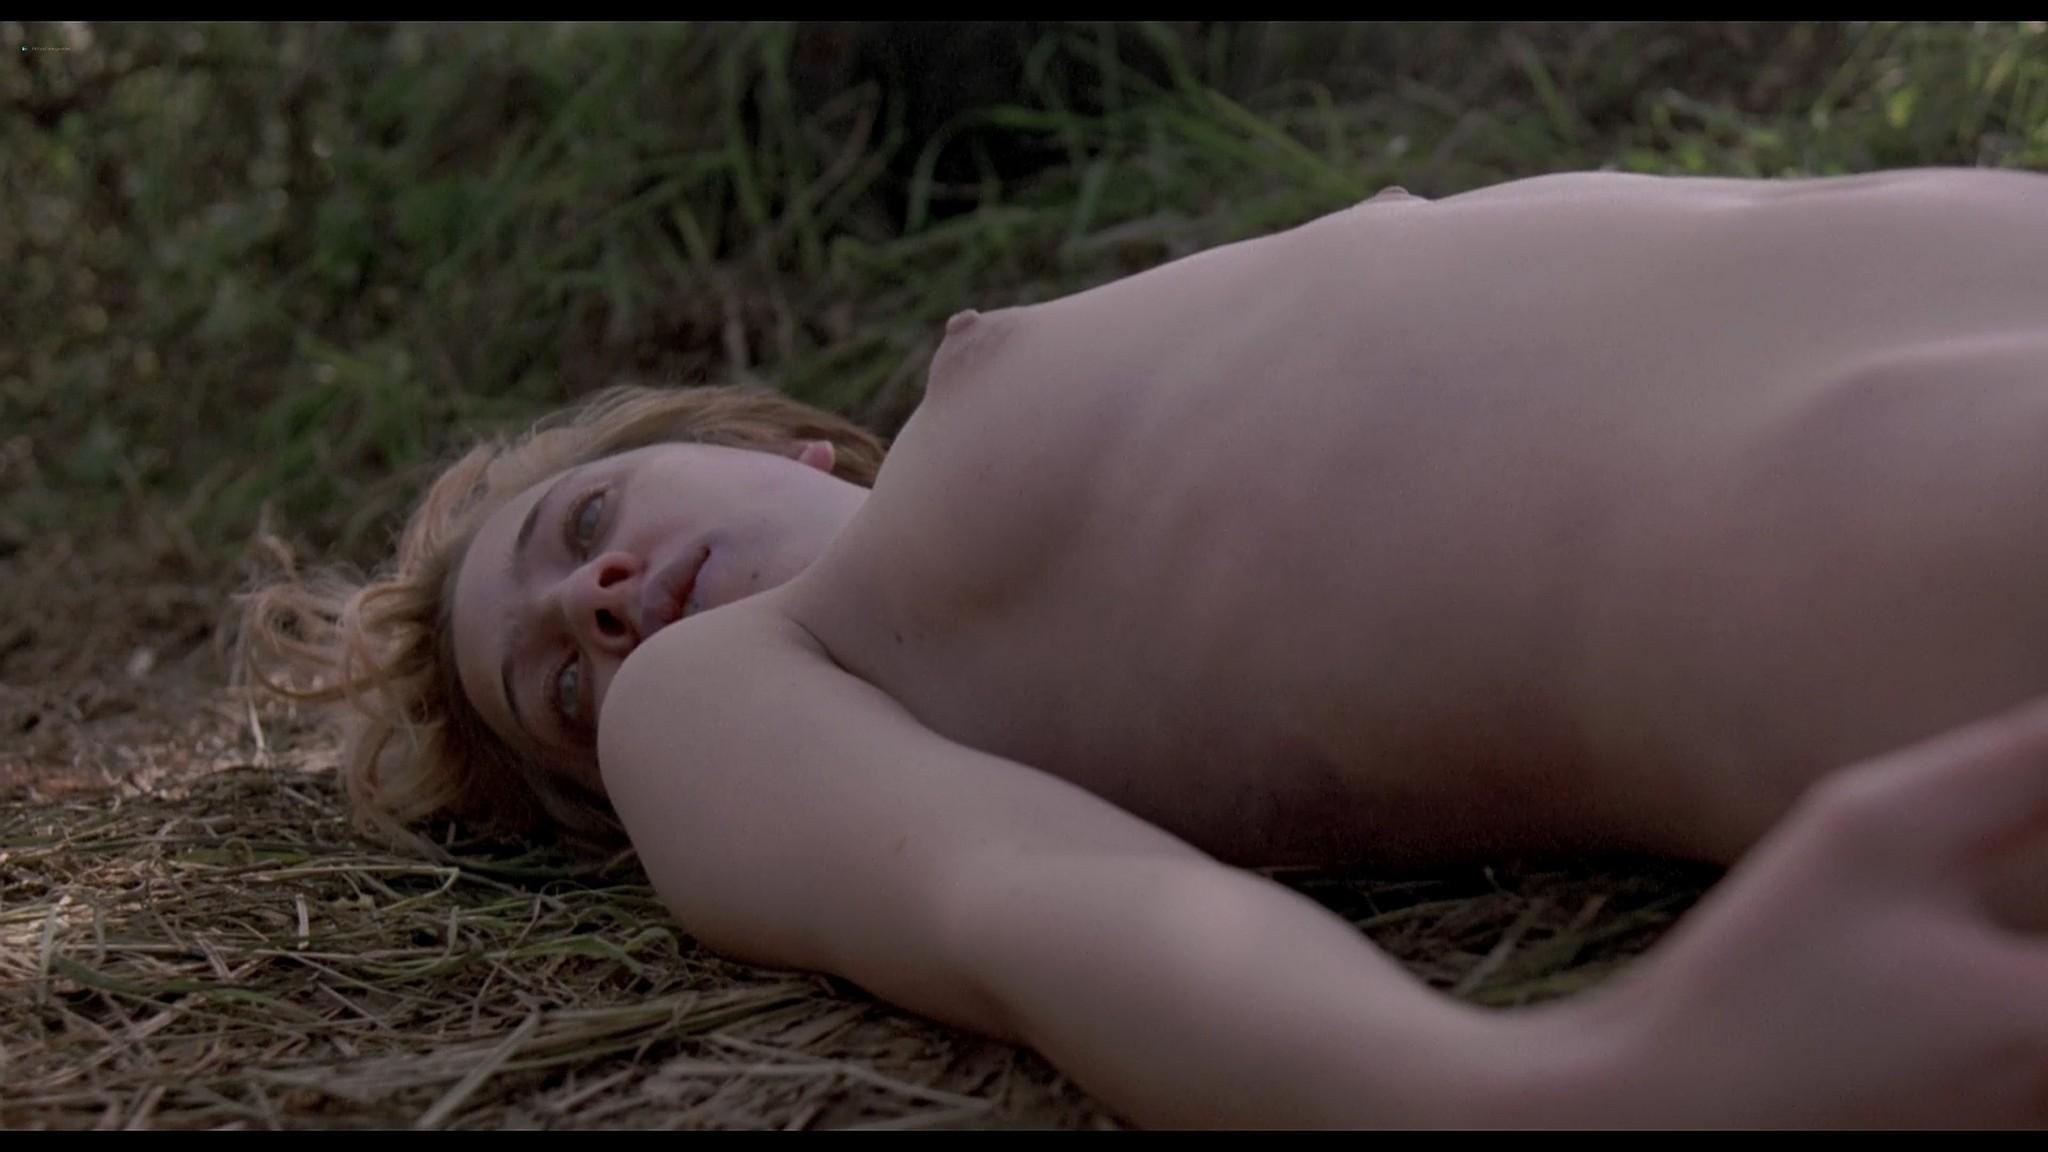 Danyi Deats nude bush topless but dead Rivers Edge 1986 HD 1080p BluRay 4